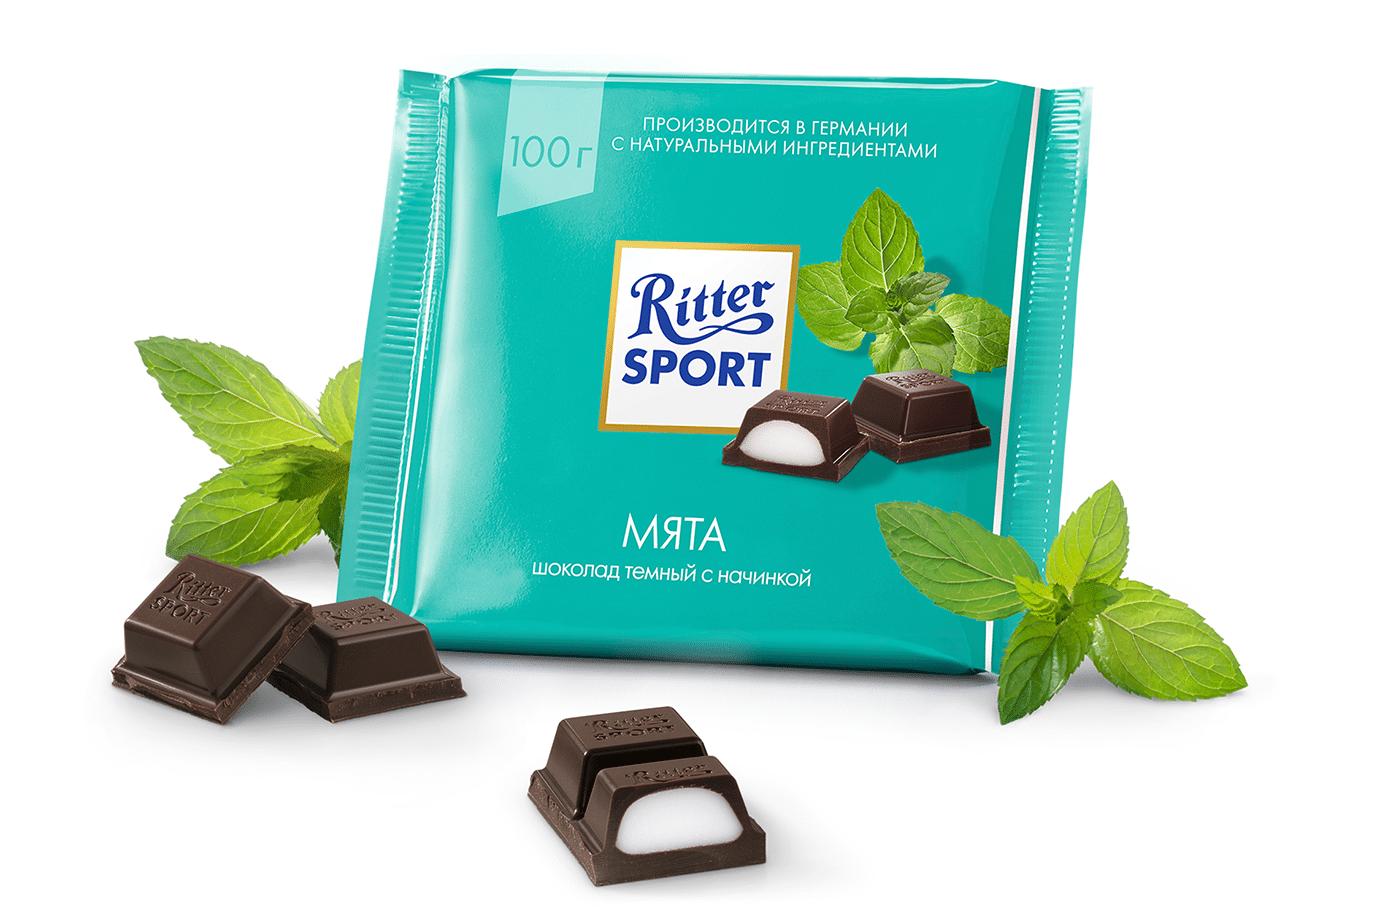 Шоколад с мятой Риттер Спорт